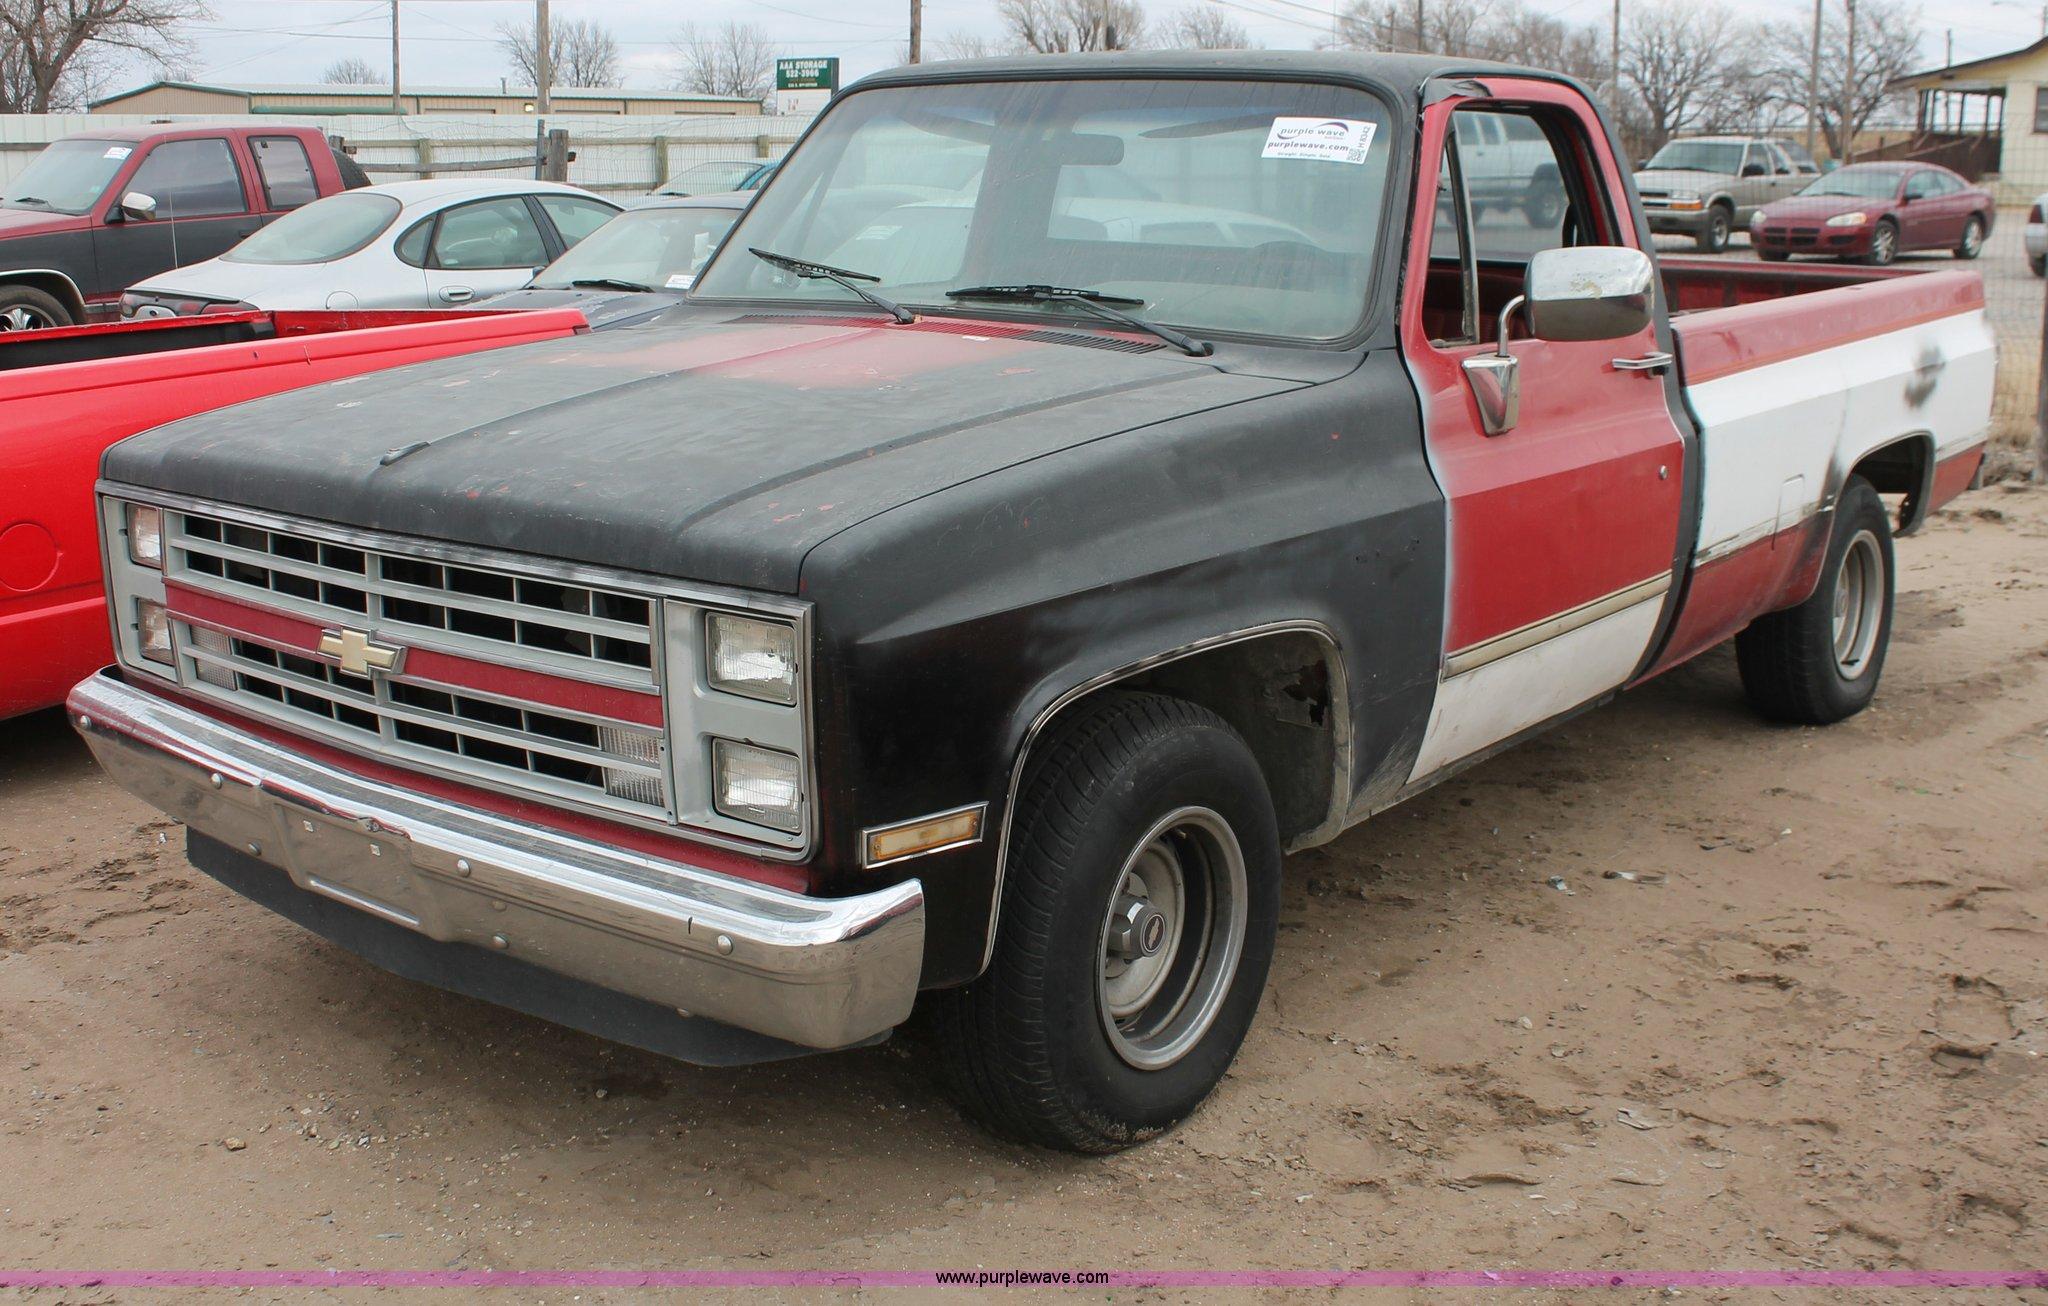 1987 Chevrolet Silverado R10 pickup truck Item H8342